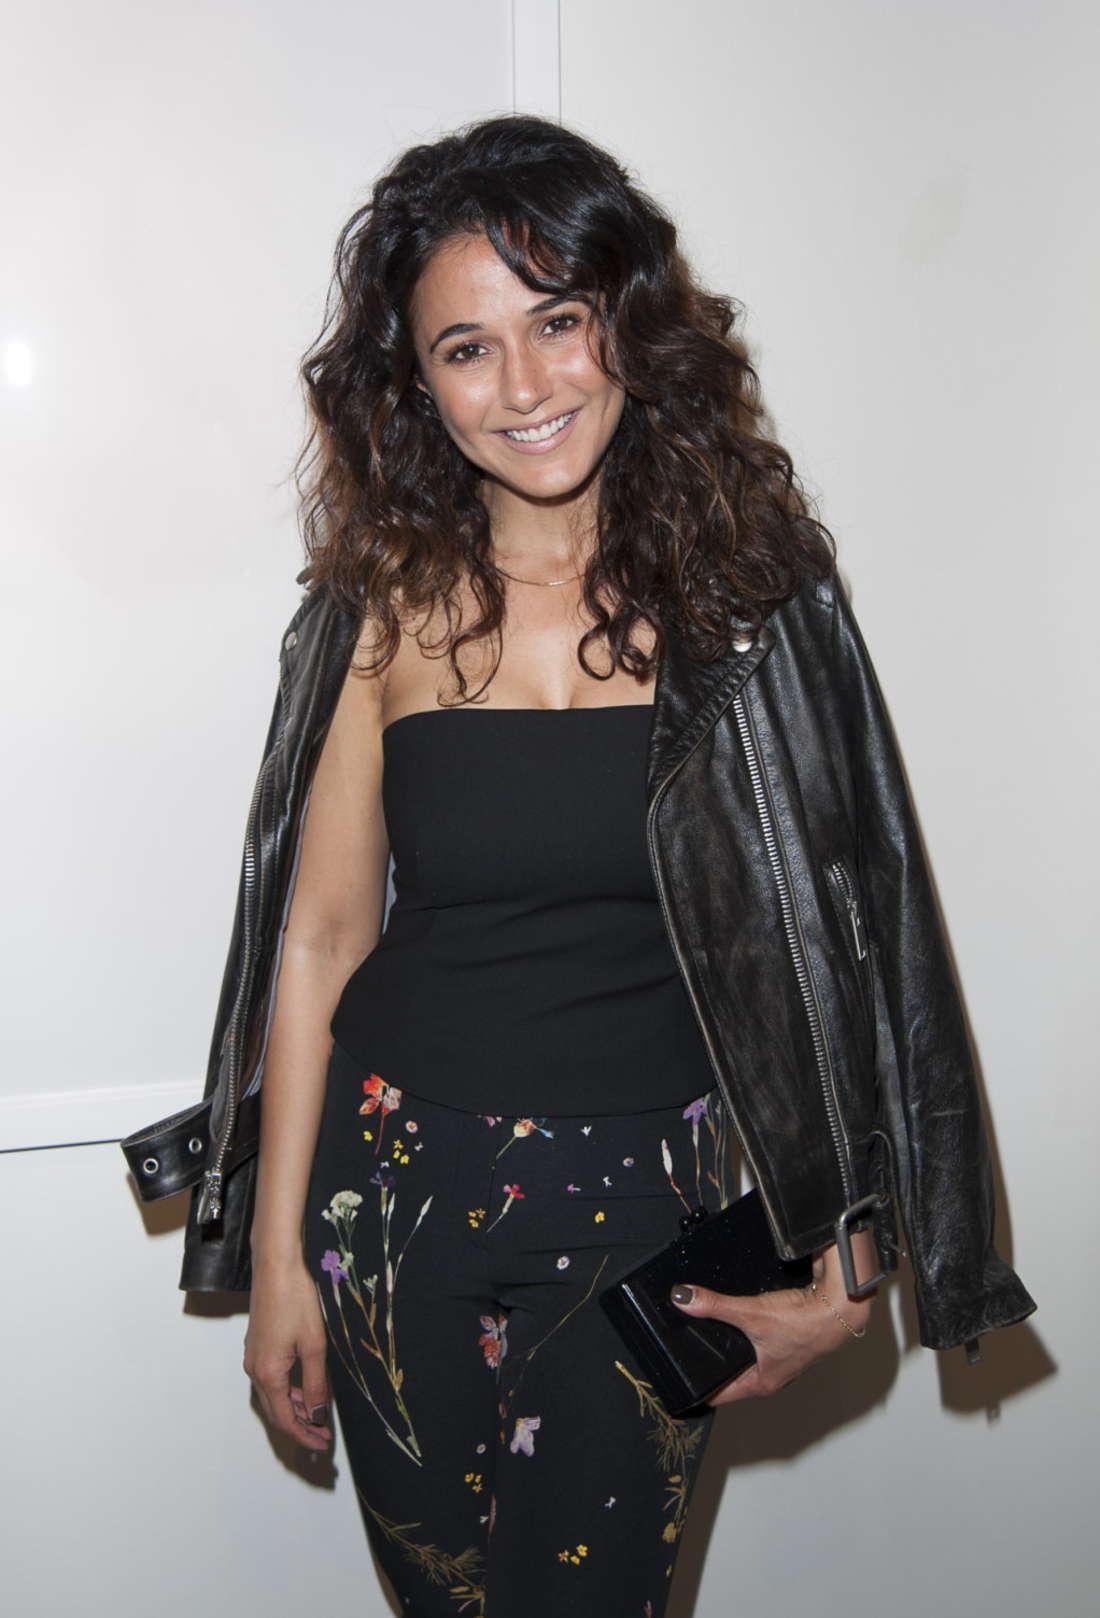 Emmanuelle Chriqui - Randall Slavin's 'Achromatic' Exhibit Opening in LA